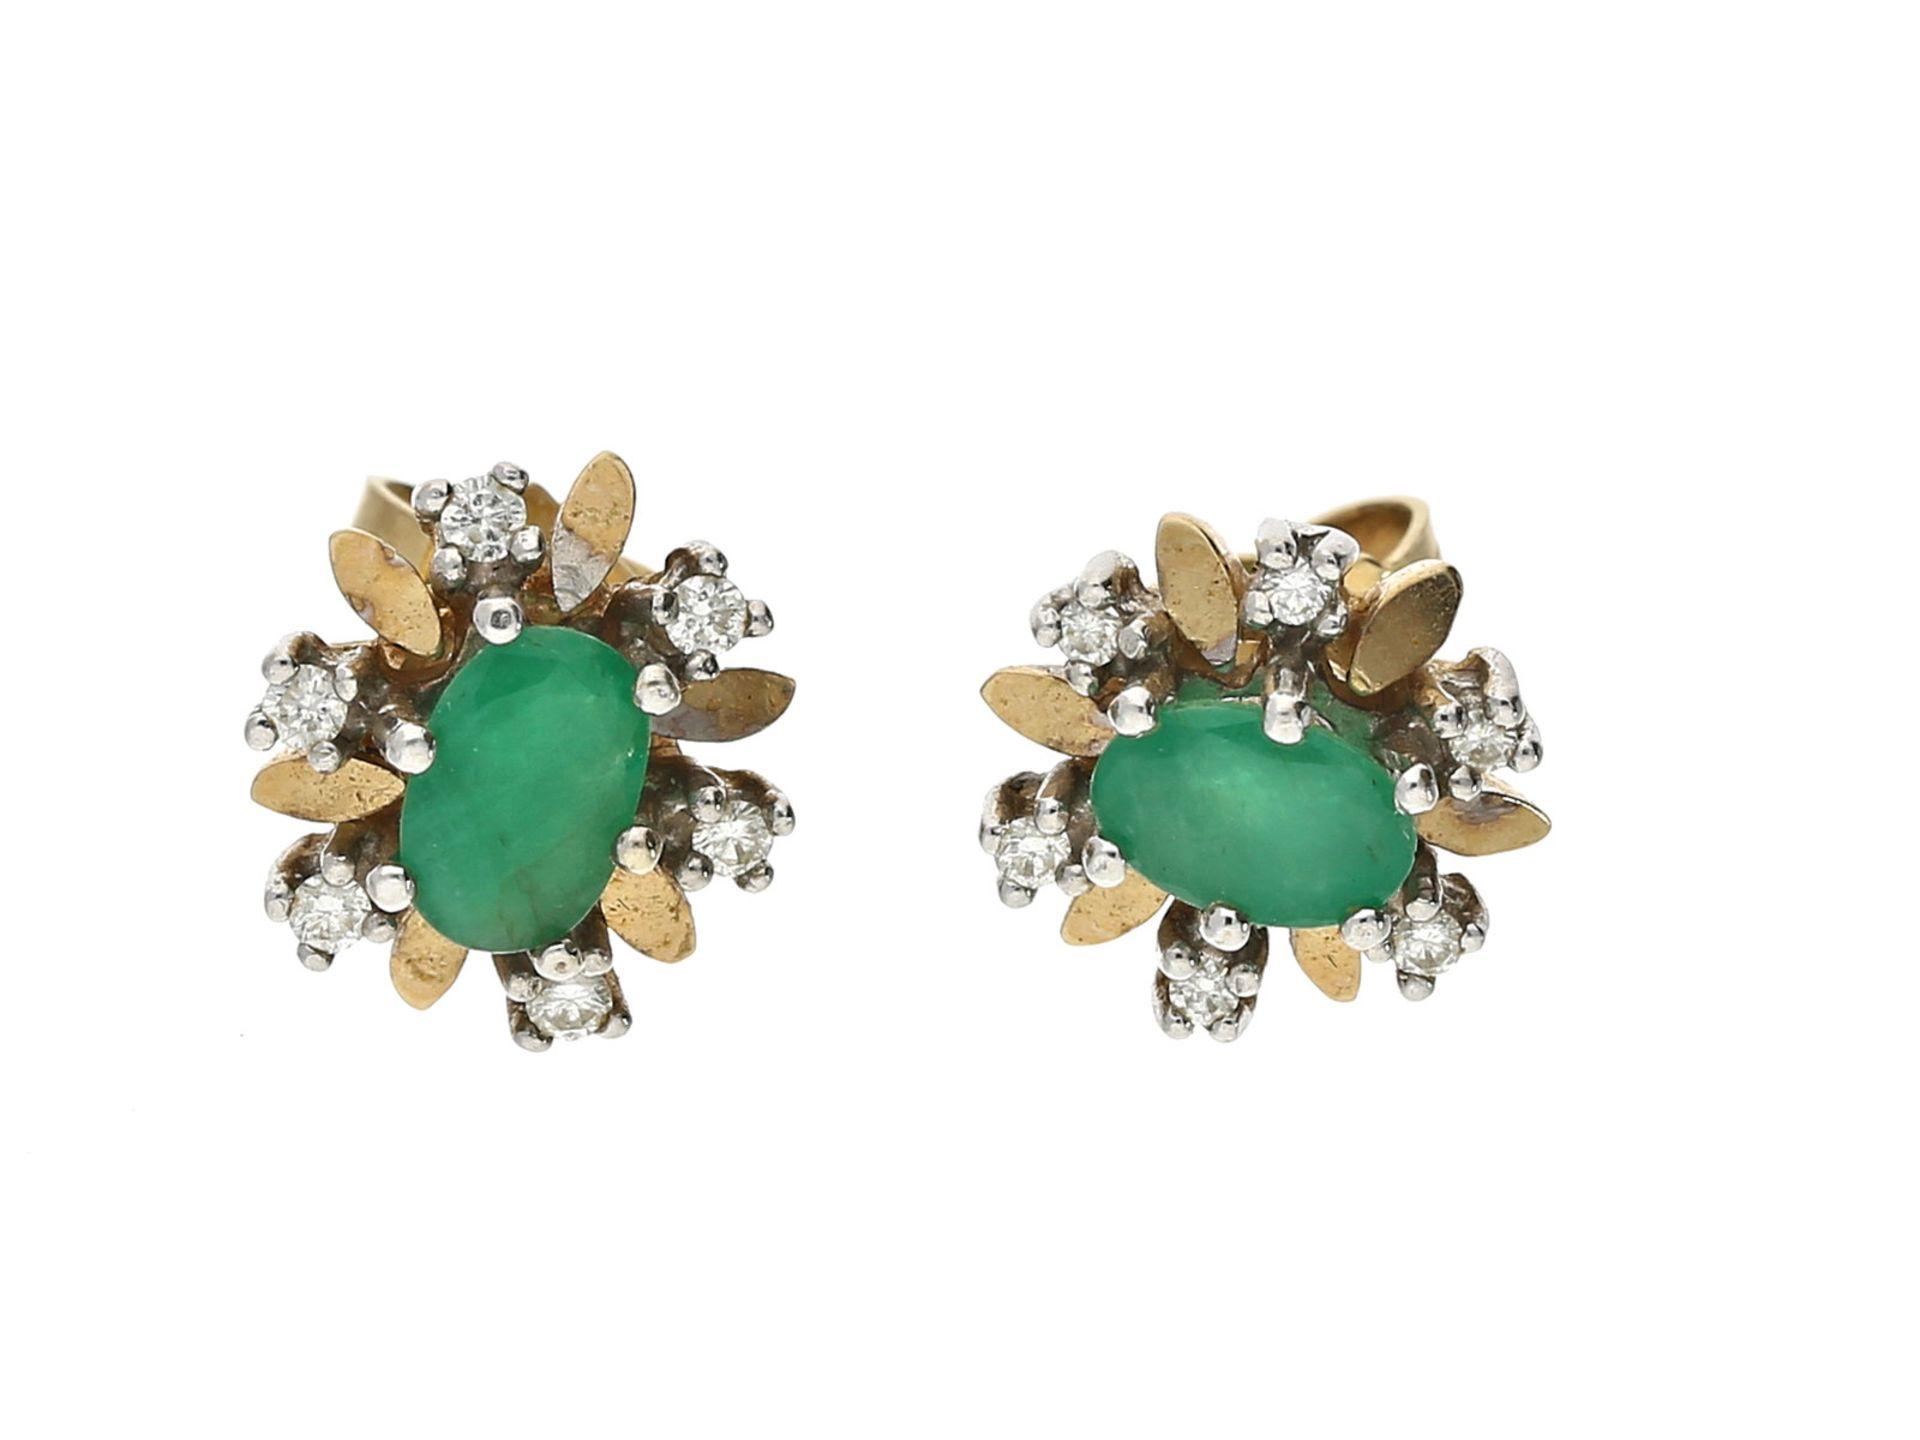 Ohrschmuck: vintage Smaragd/Brillant-OhrsteckerCa. 4,2g, 14K Gold, Stopper ebenfalls, jeweils